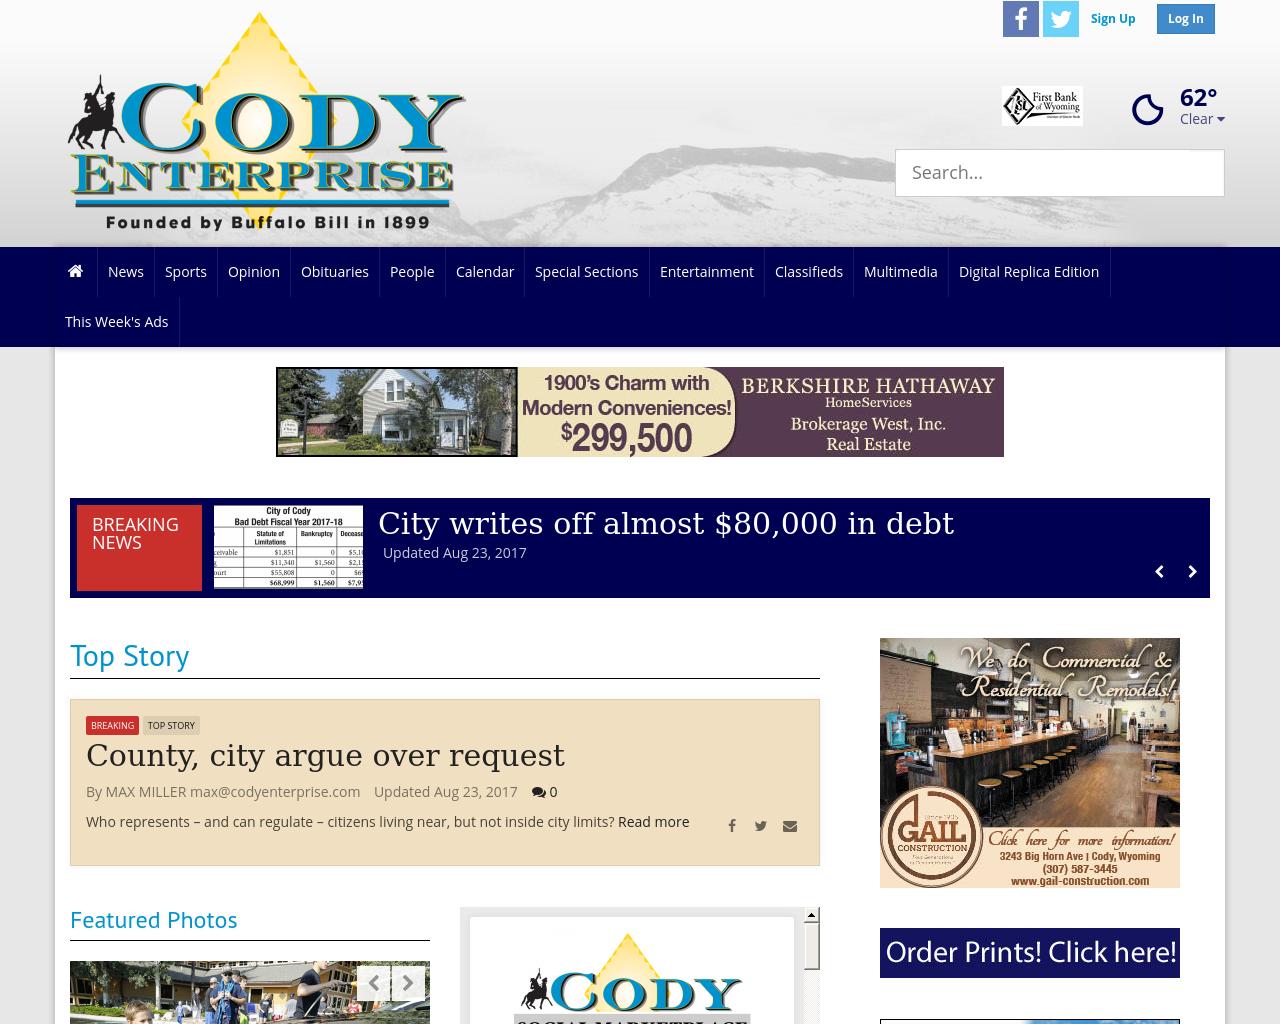 codyenterprise.com-Advertising-Reviews-Pricing